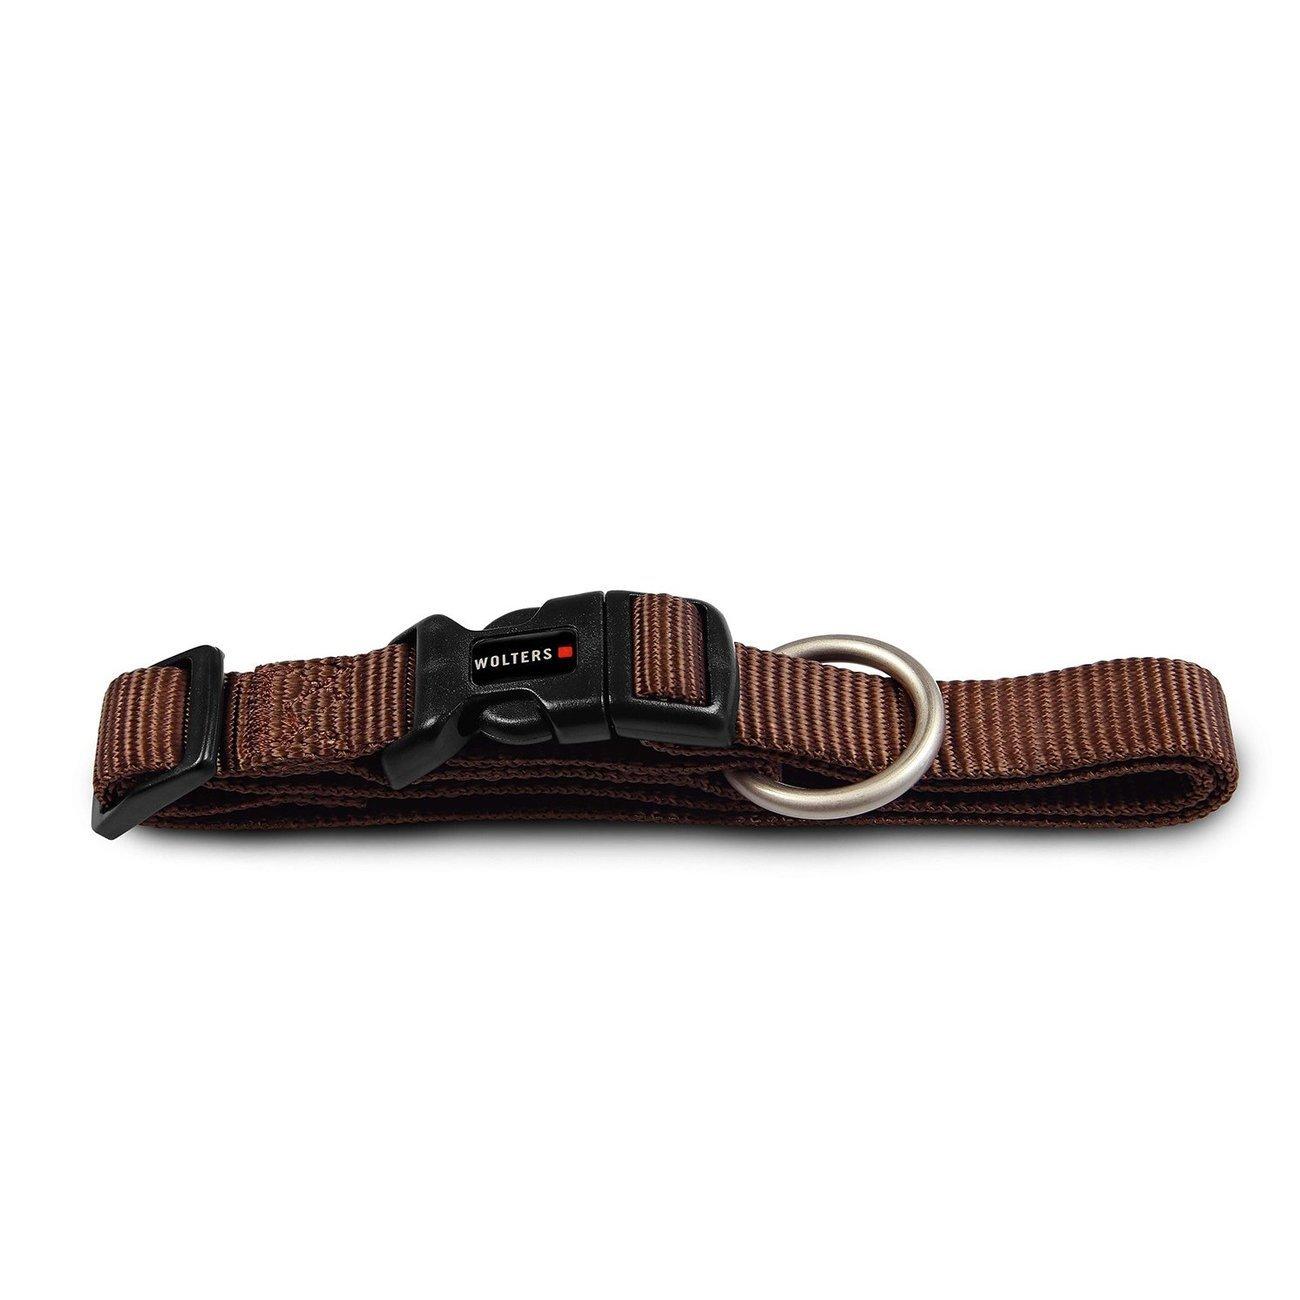 Wolters Halsband Nylon Professional, Bild 12